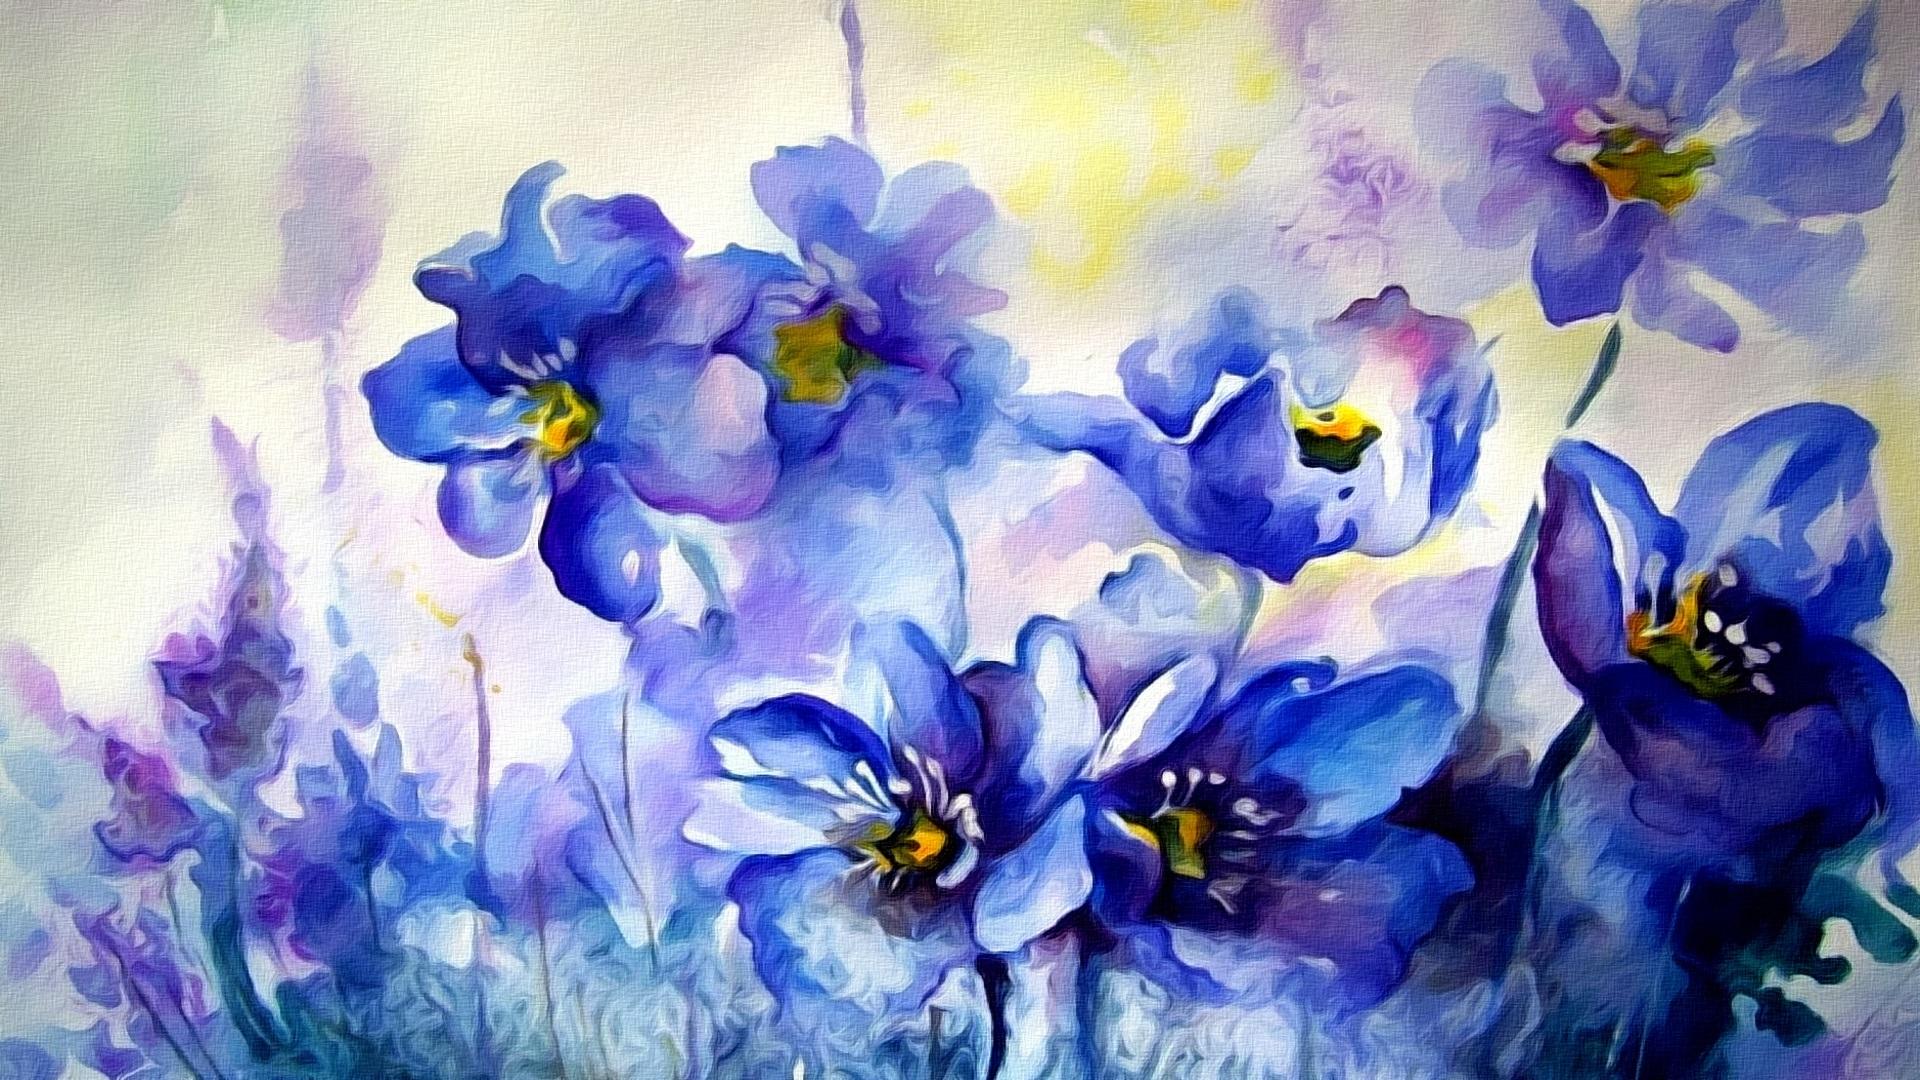 Wallpaper Watercolor Painting Blue Flowers 1920x1080 Full